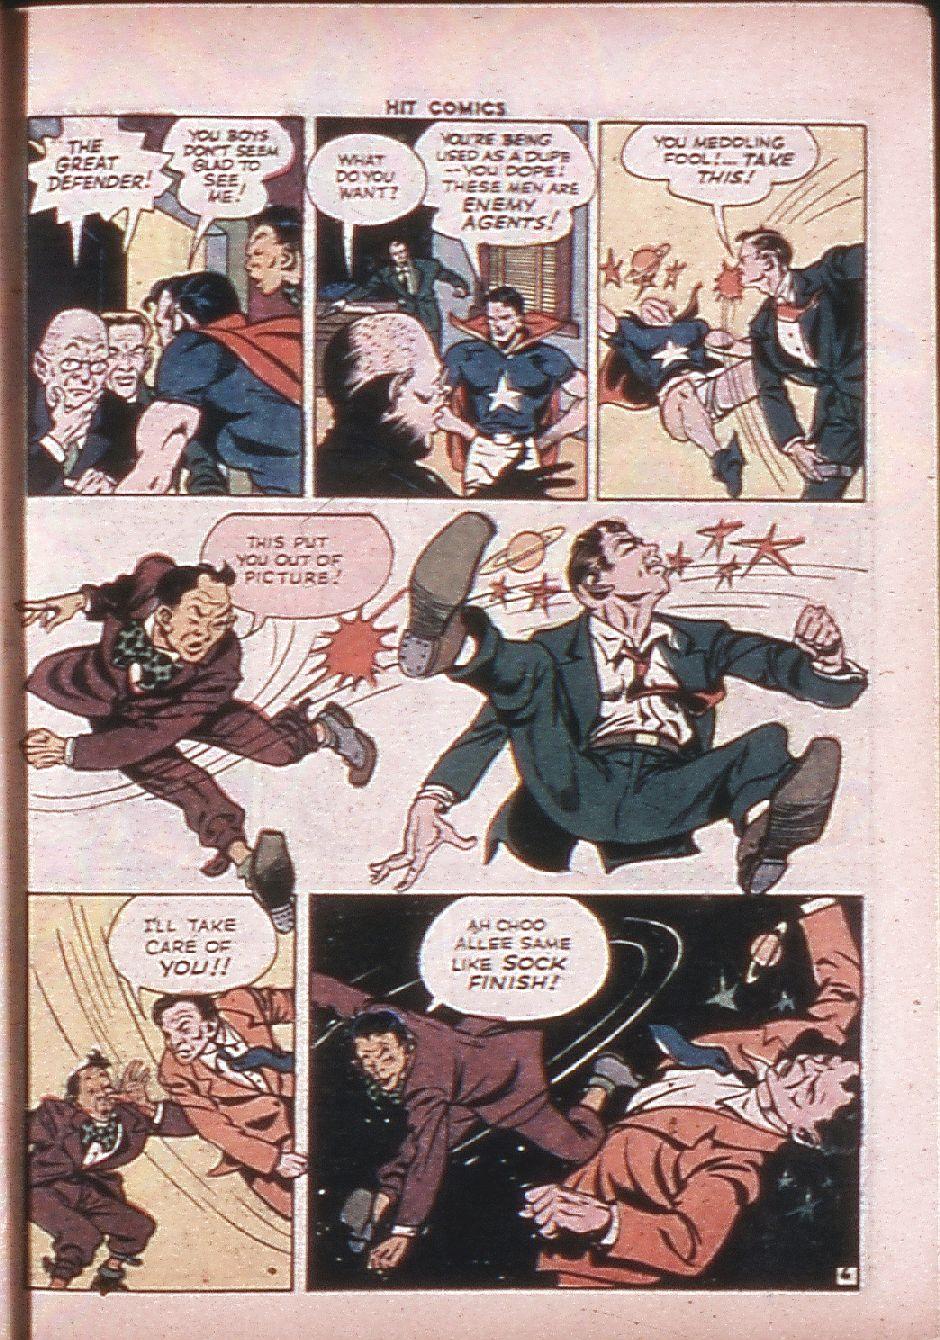 Read online Hit Comics comic -  Issue #33 - 42